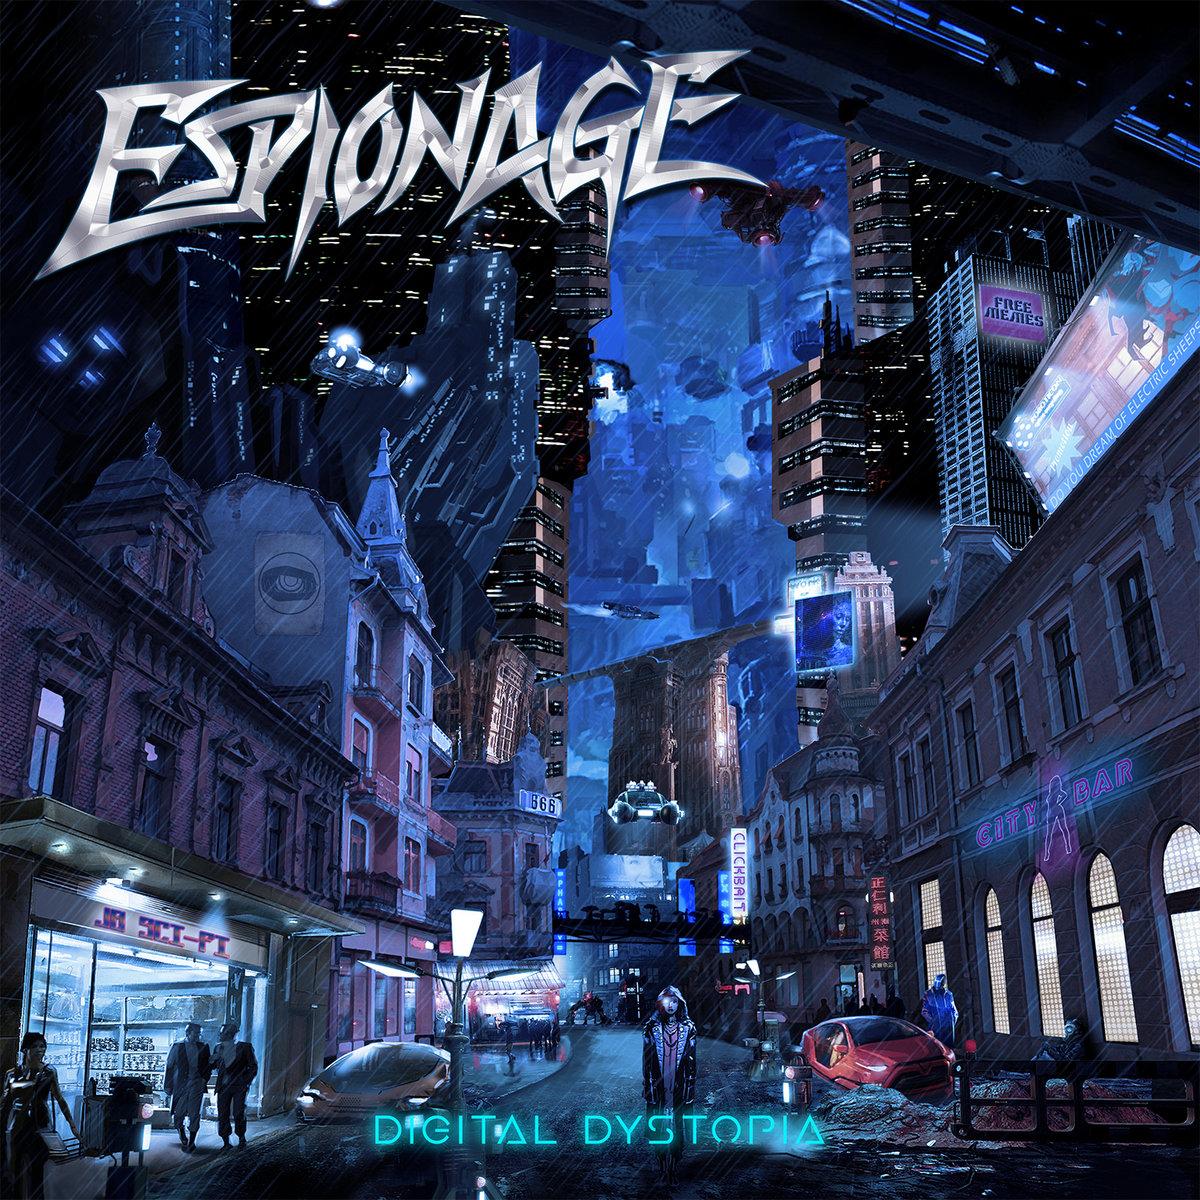 Resultado de imagem para Espionage - Digital Dystopia